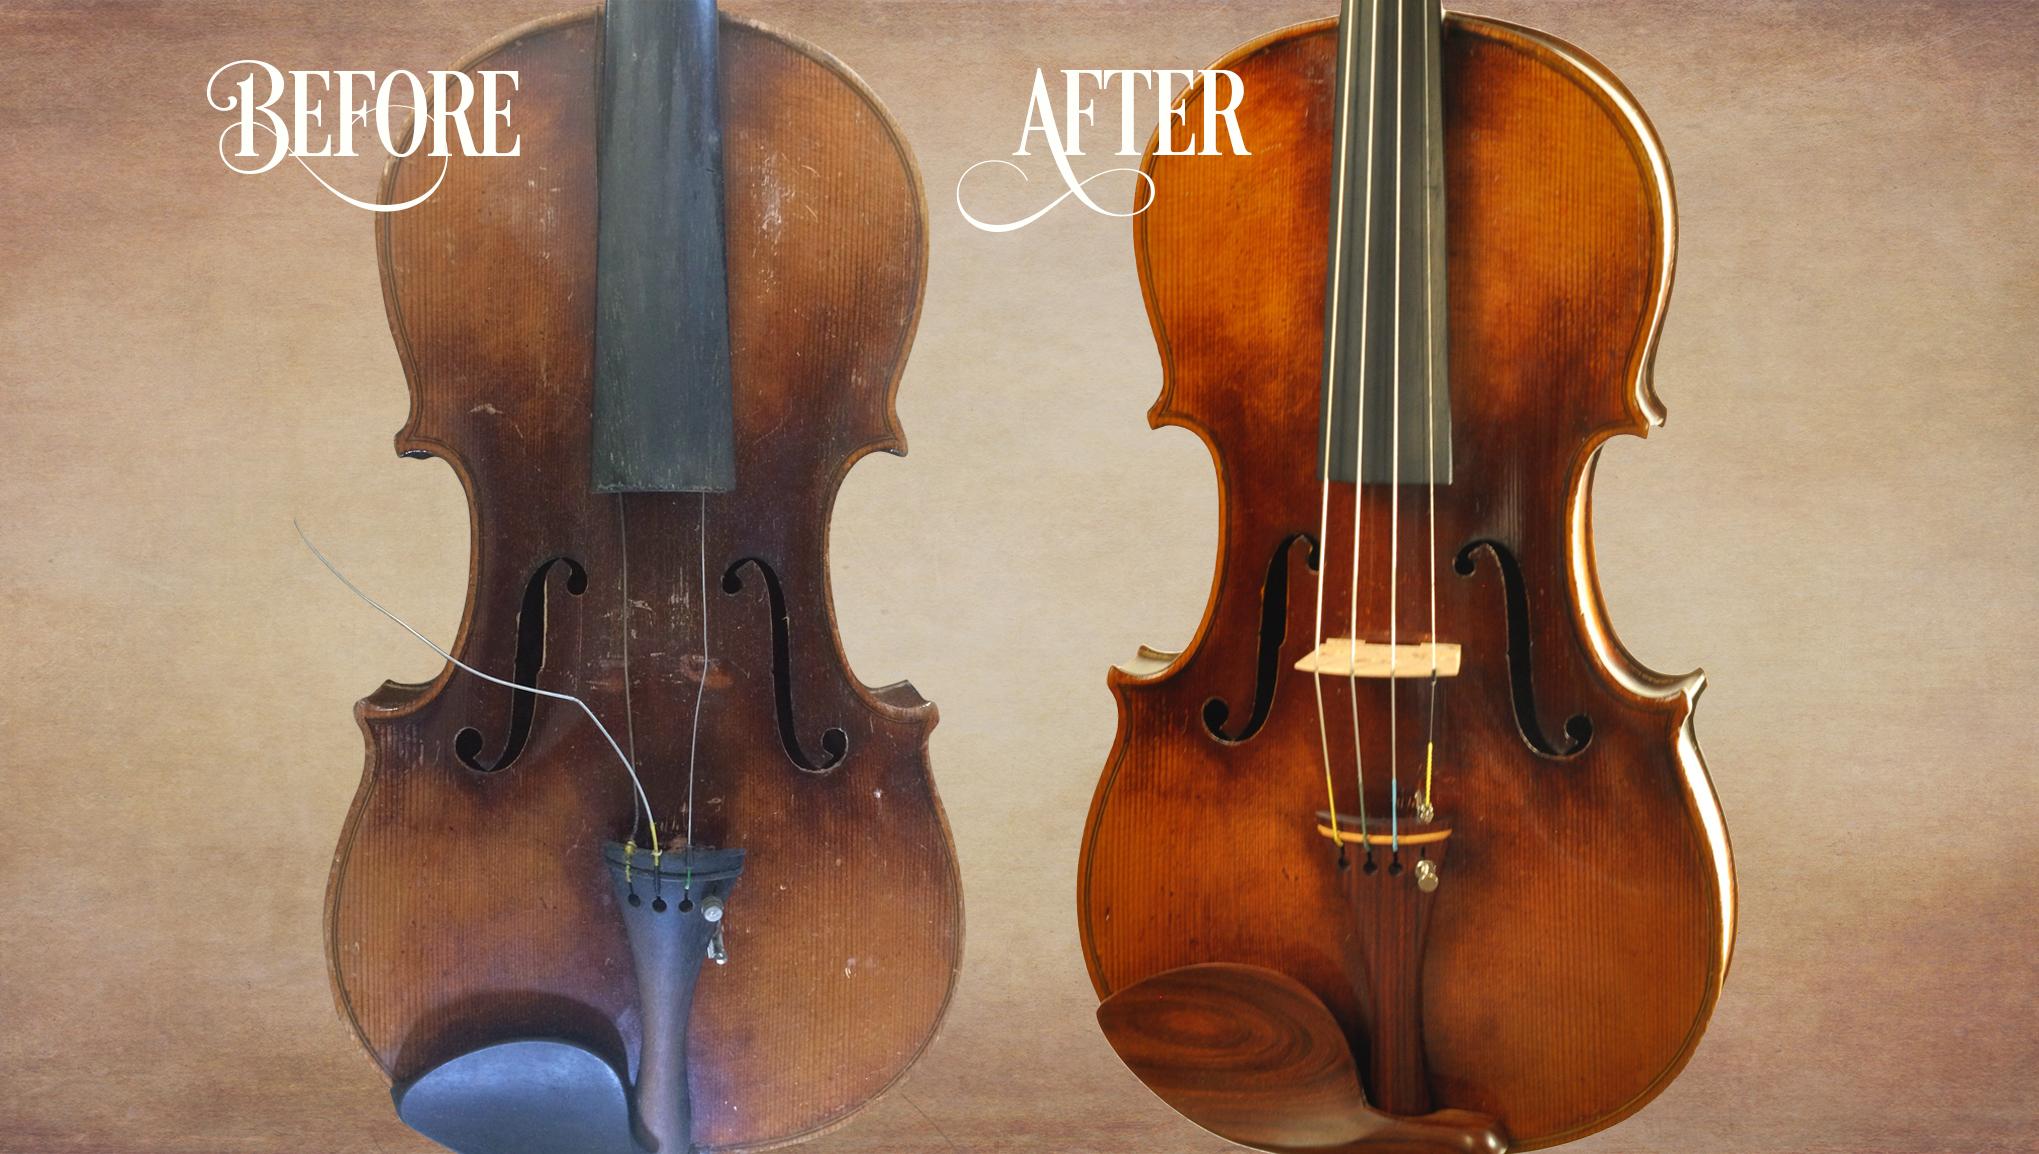 Before-After Violin.jpg